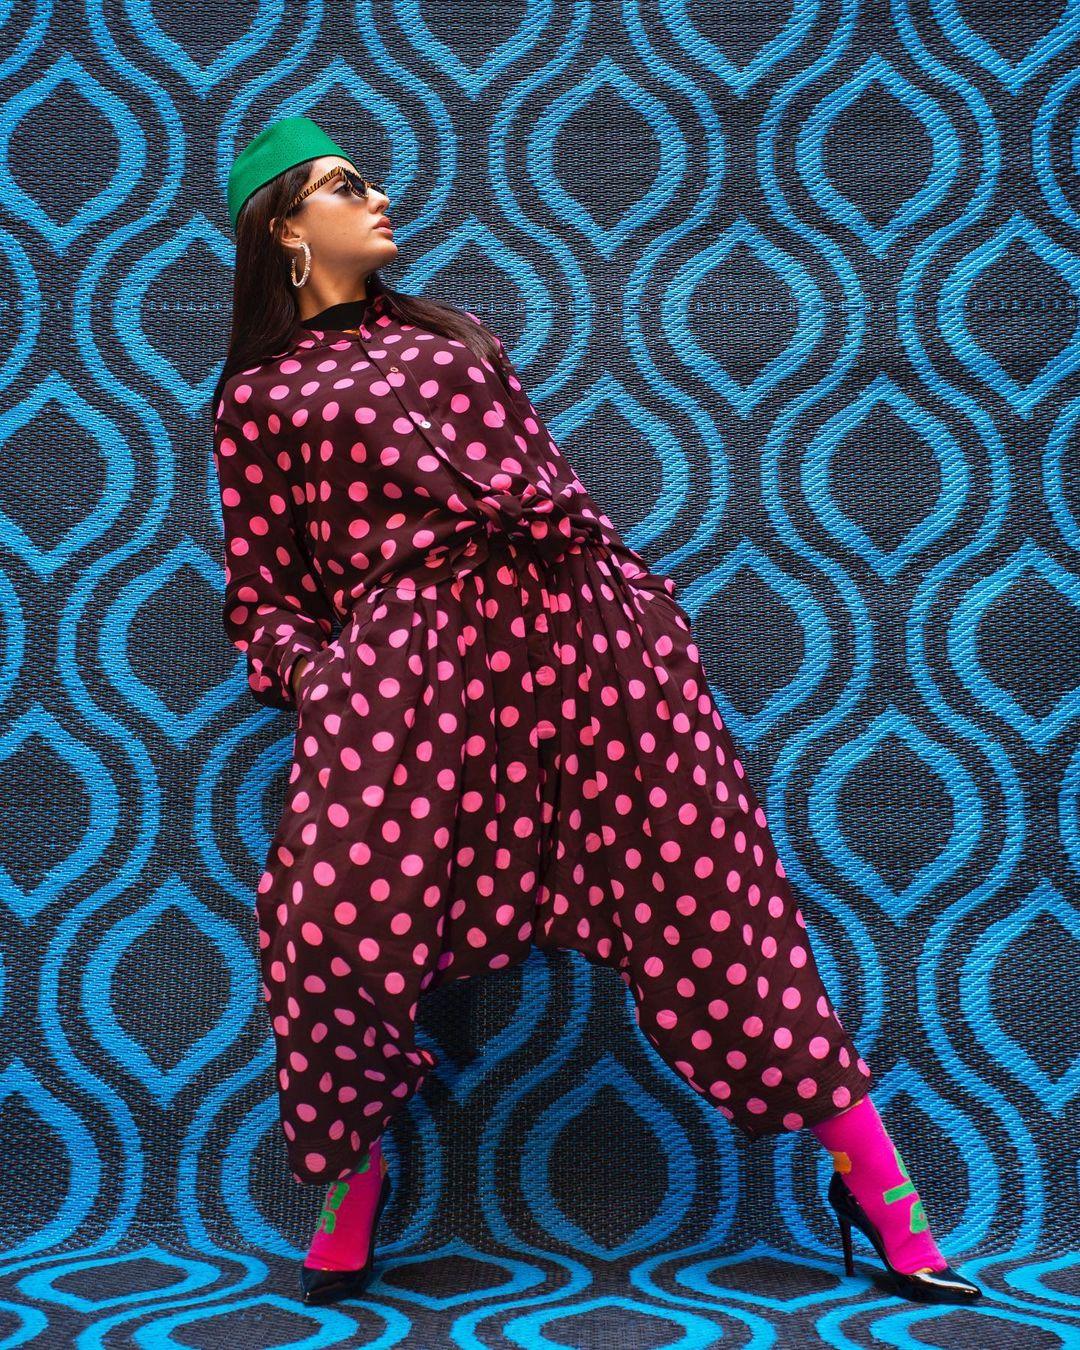 Nora Fatehi theme shoot